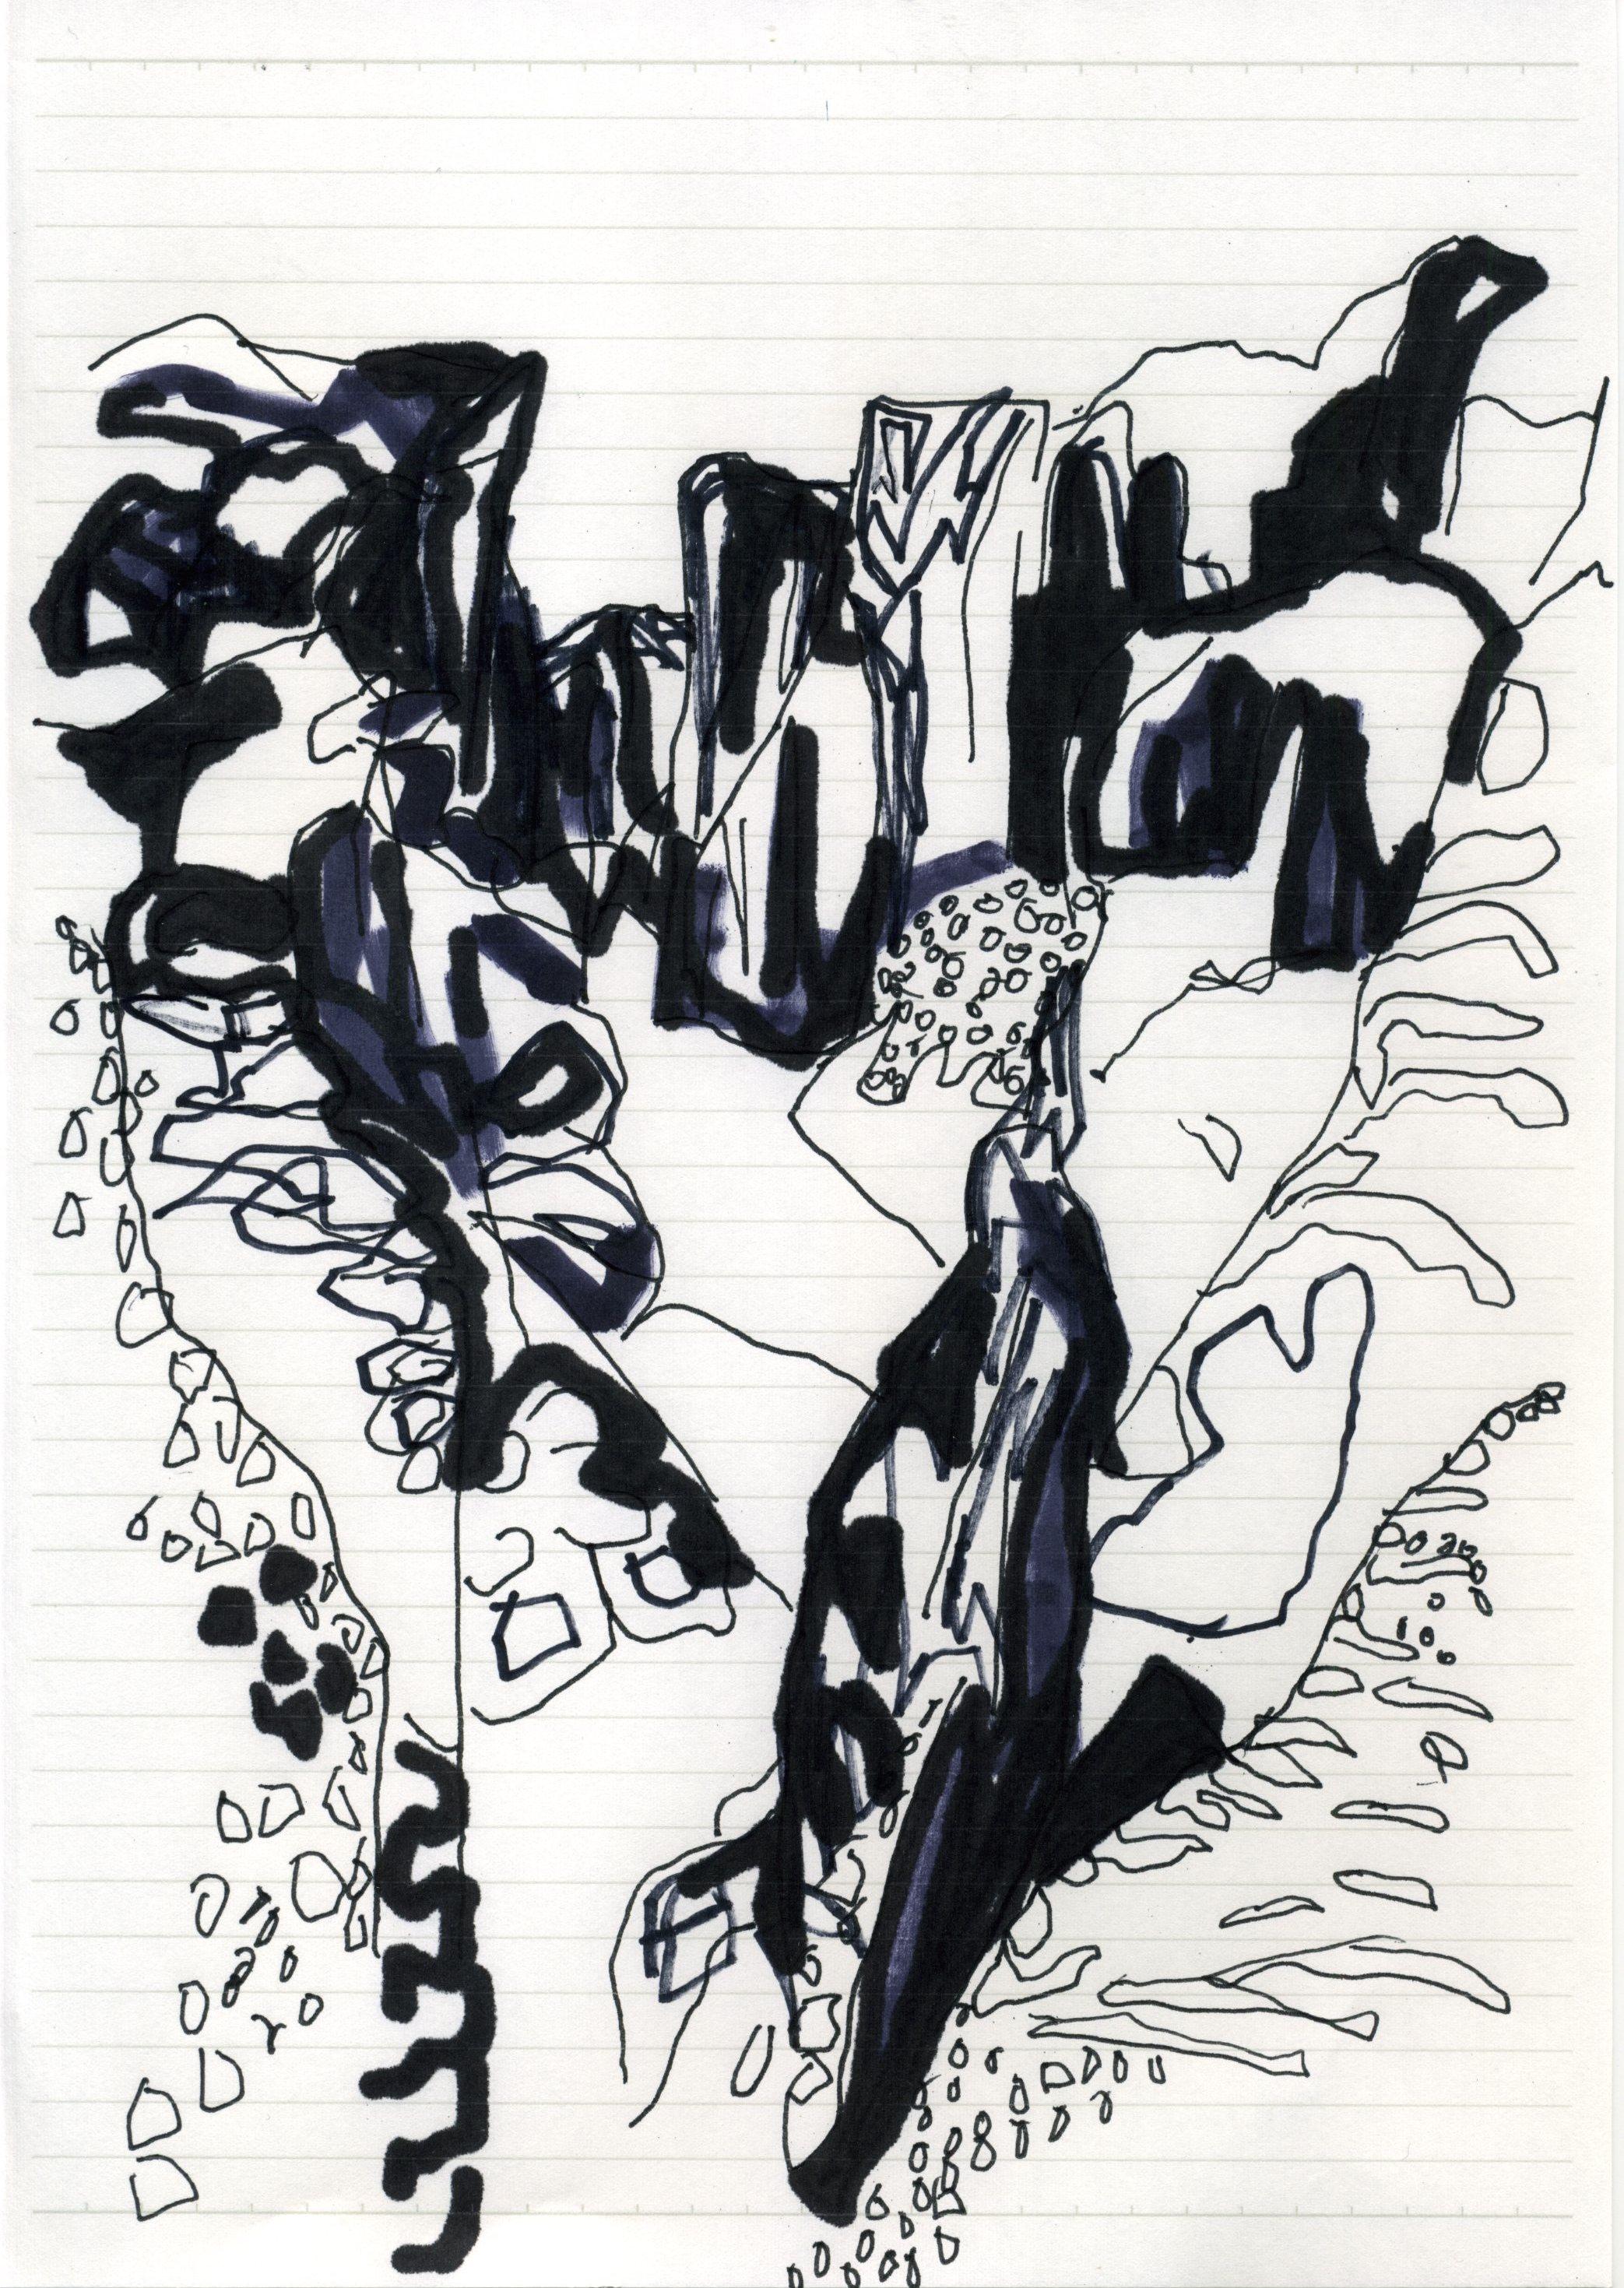 Gullfoss drawing